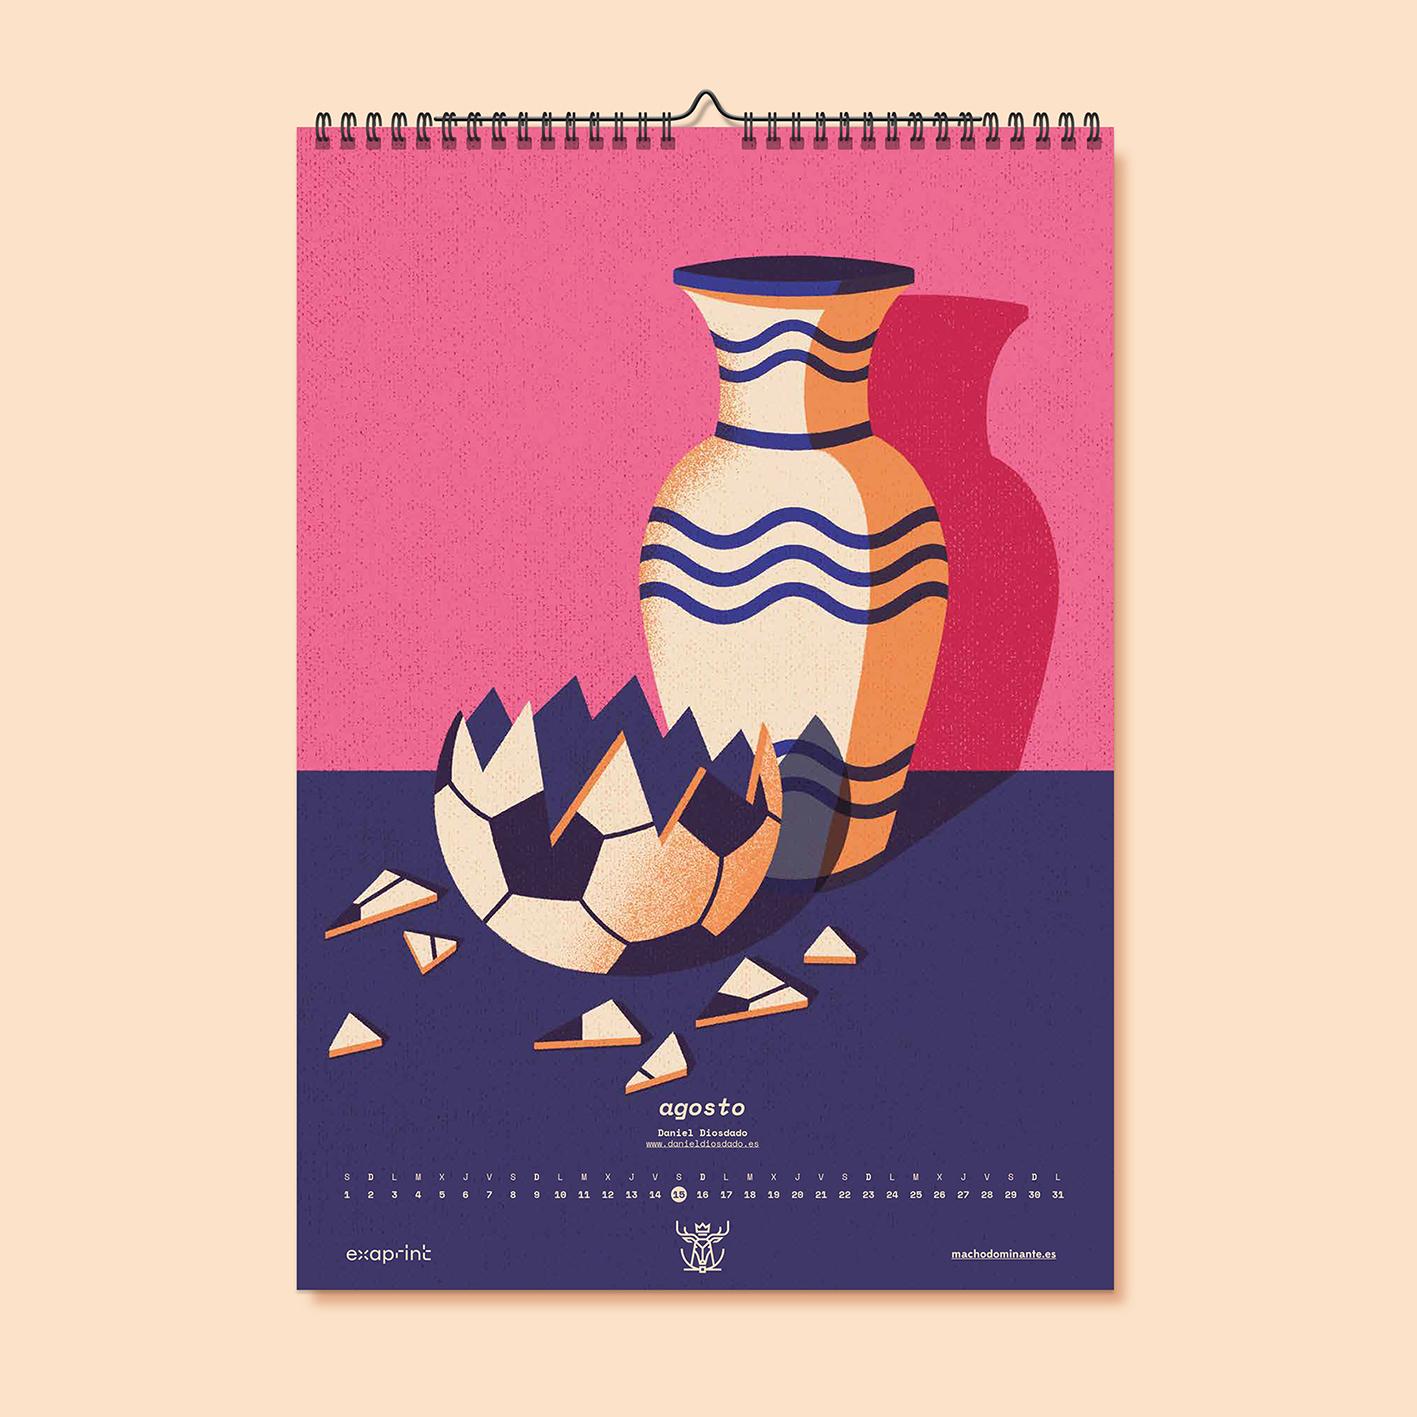 Daniel Diosdado: Calendario Macho Dominante